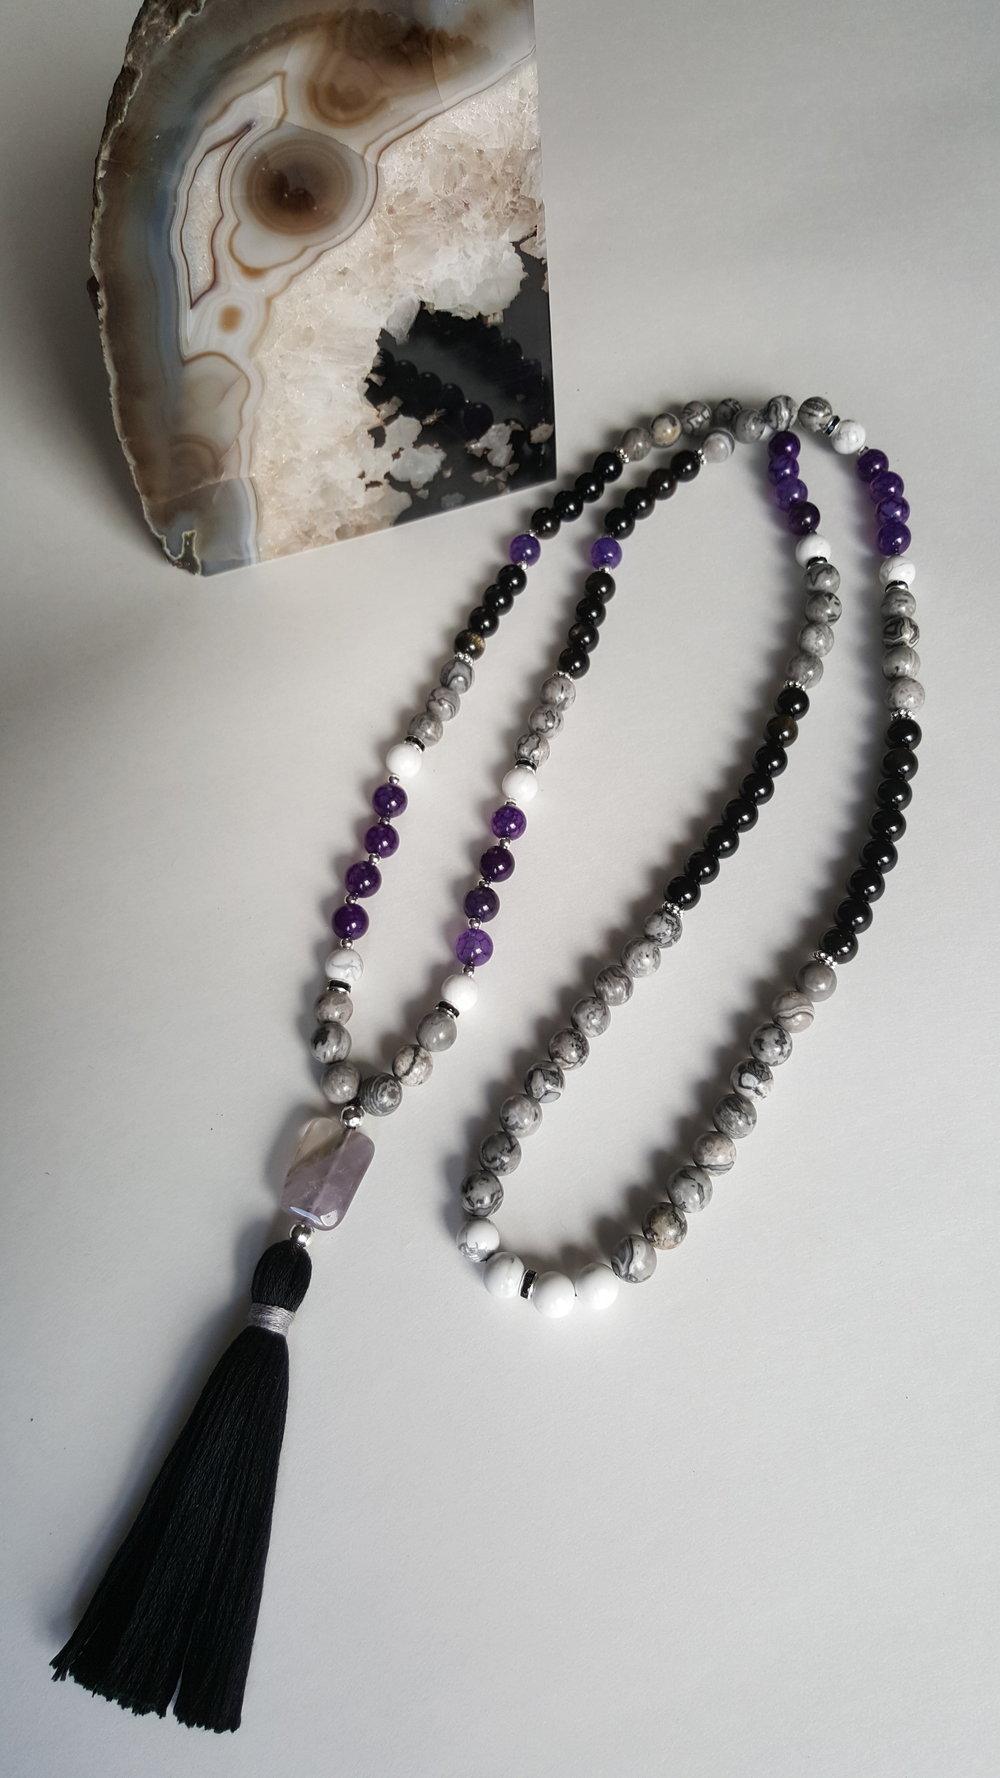 S T R E N G T H ; black obsidian + picture jasper + howlite + crackle agate + amethyst guru bead